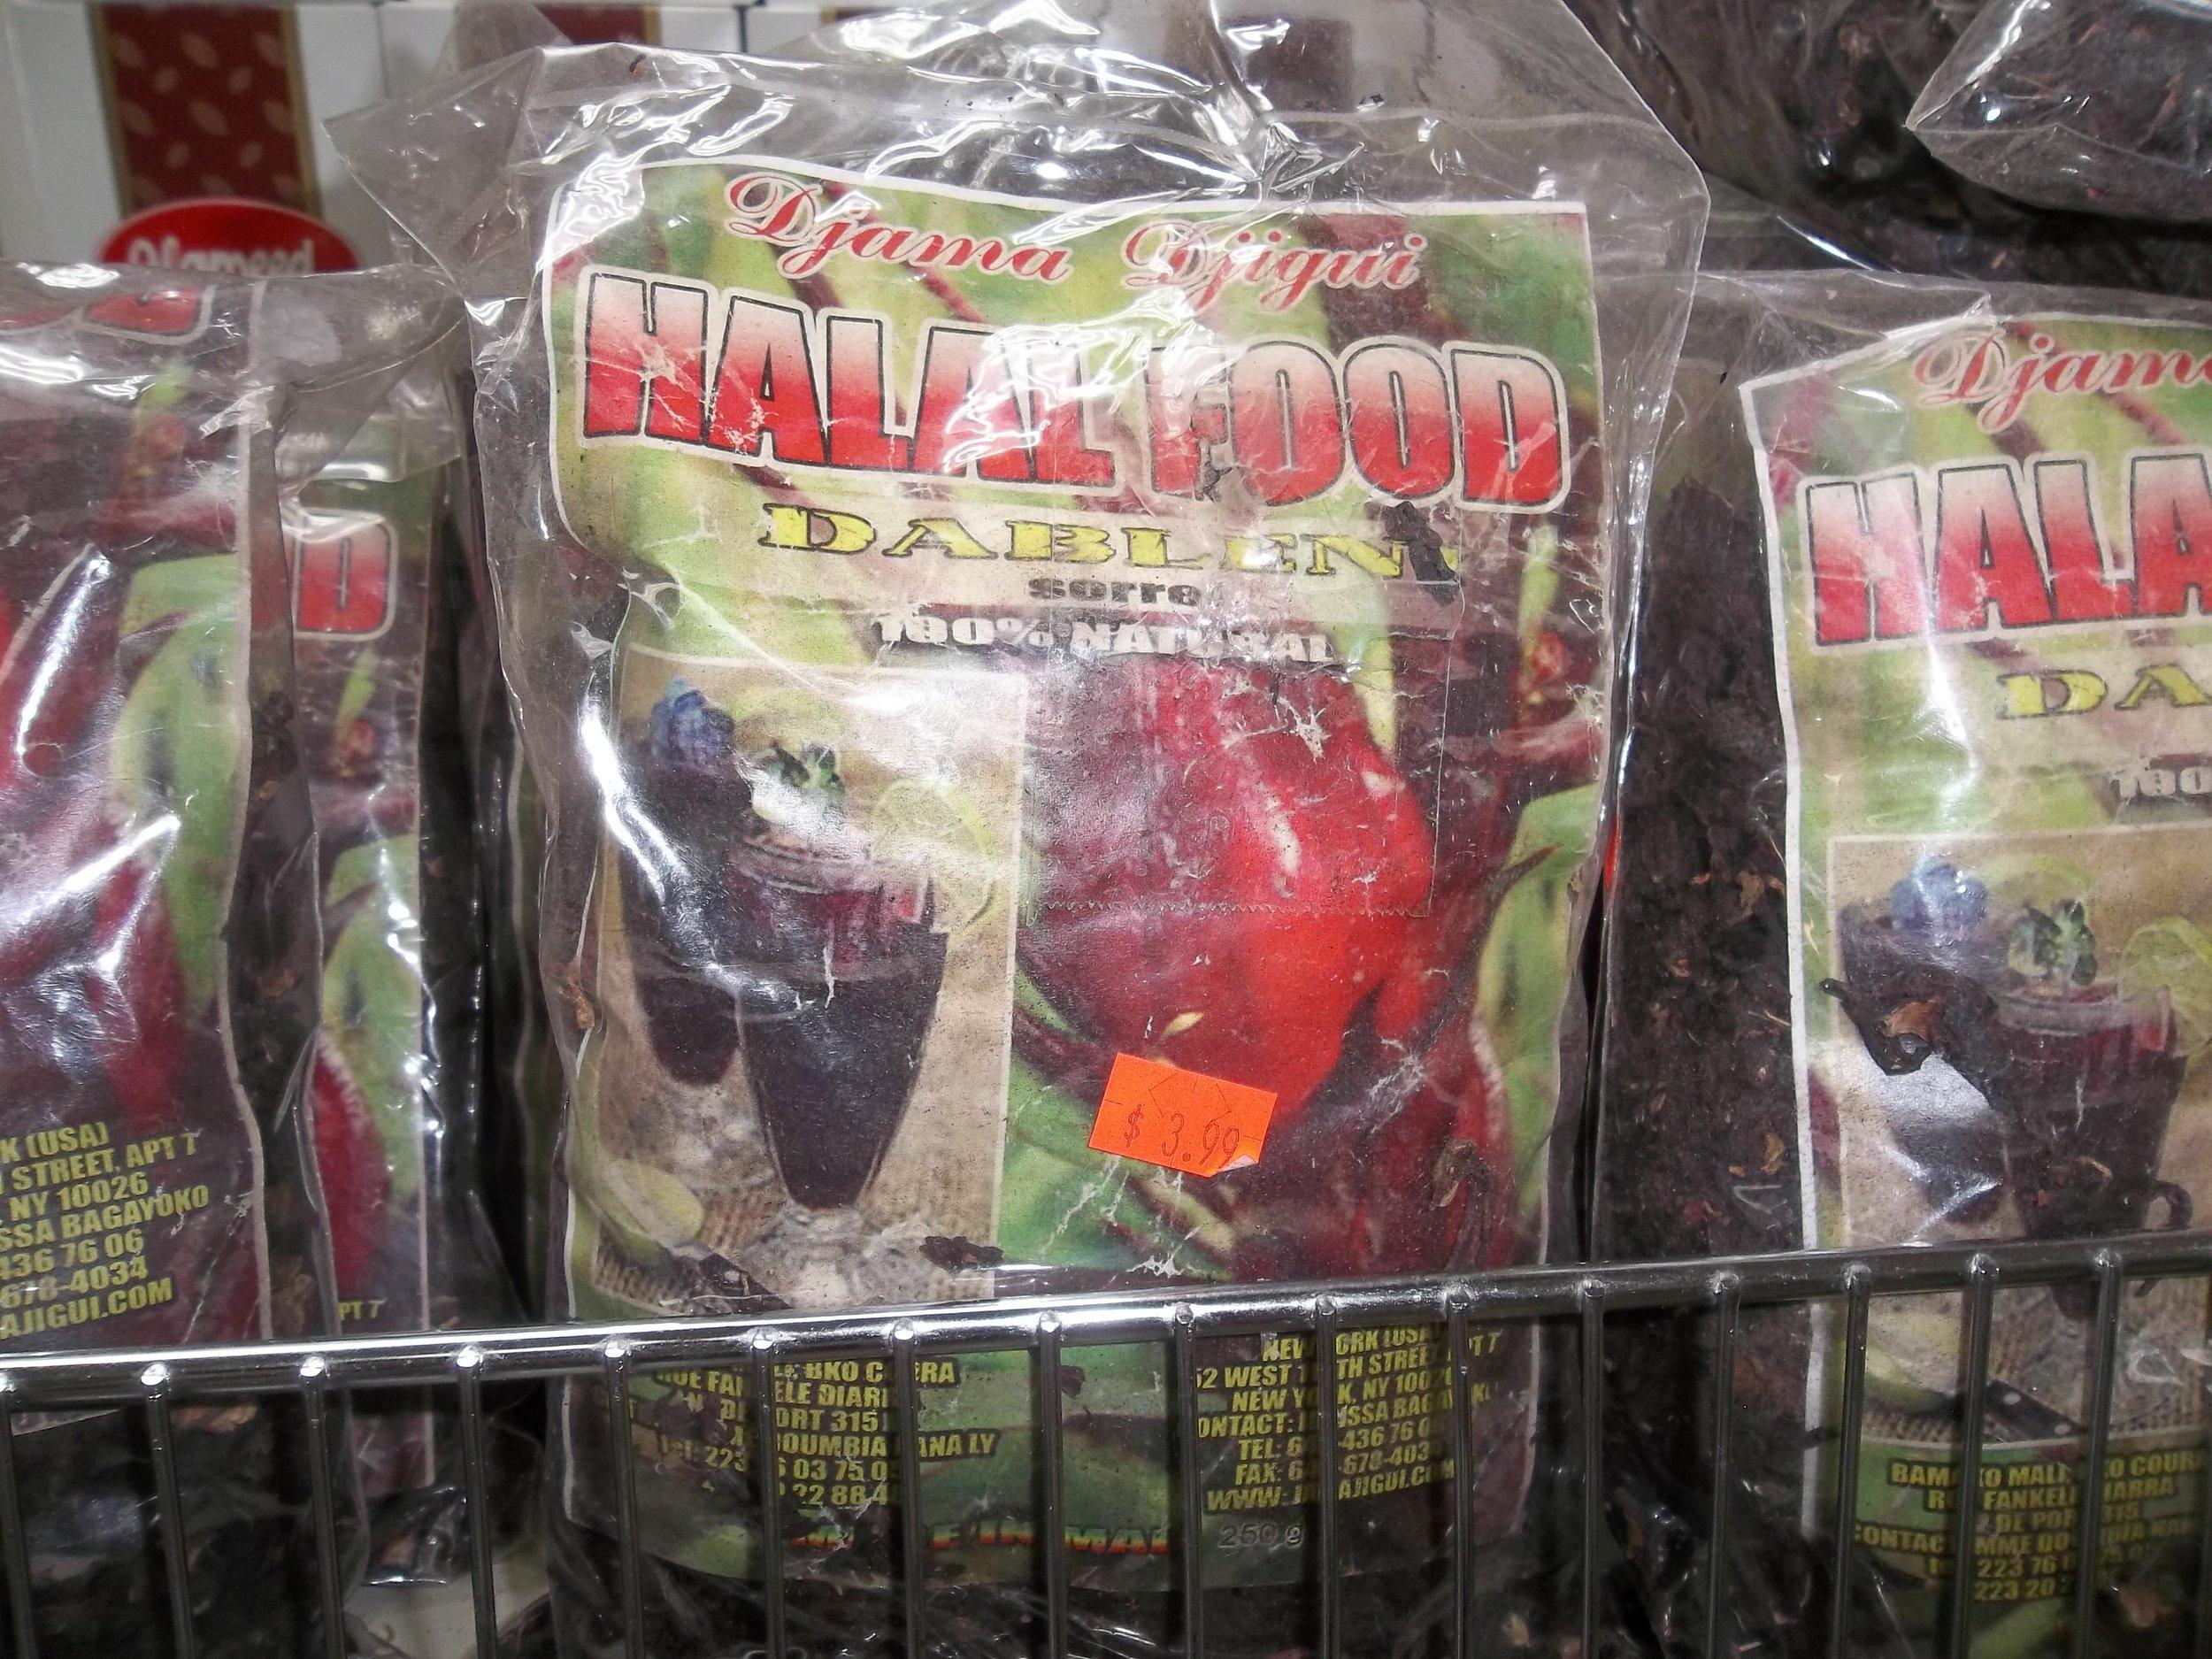 Dablin-Sorre-Pak-Halal-Mediterranean- Grocery-Store-12259-W-87th-St-Pkwy-Lenexa-KS-66215.JPG